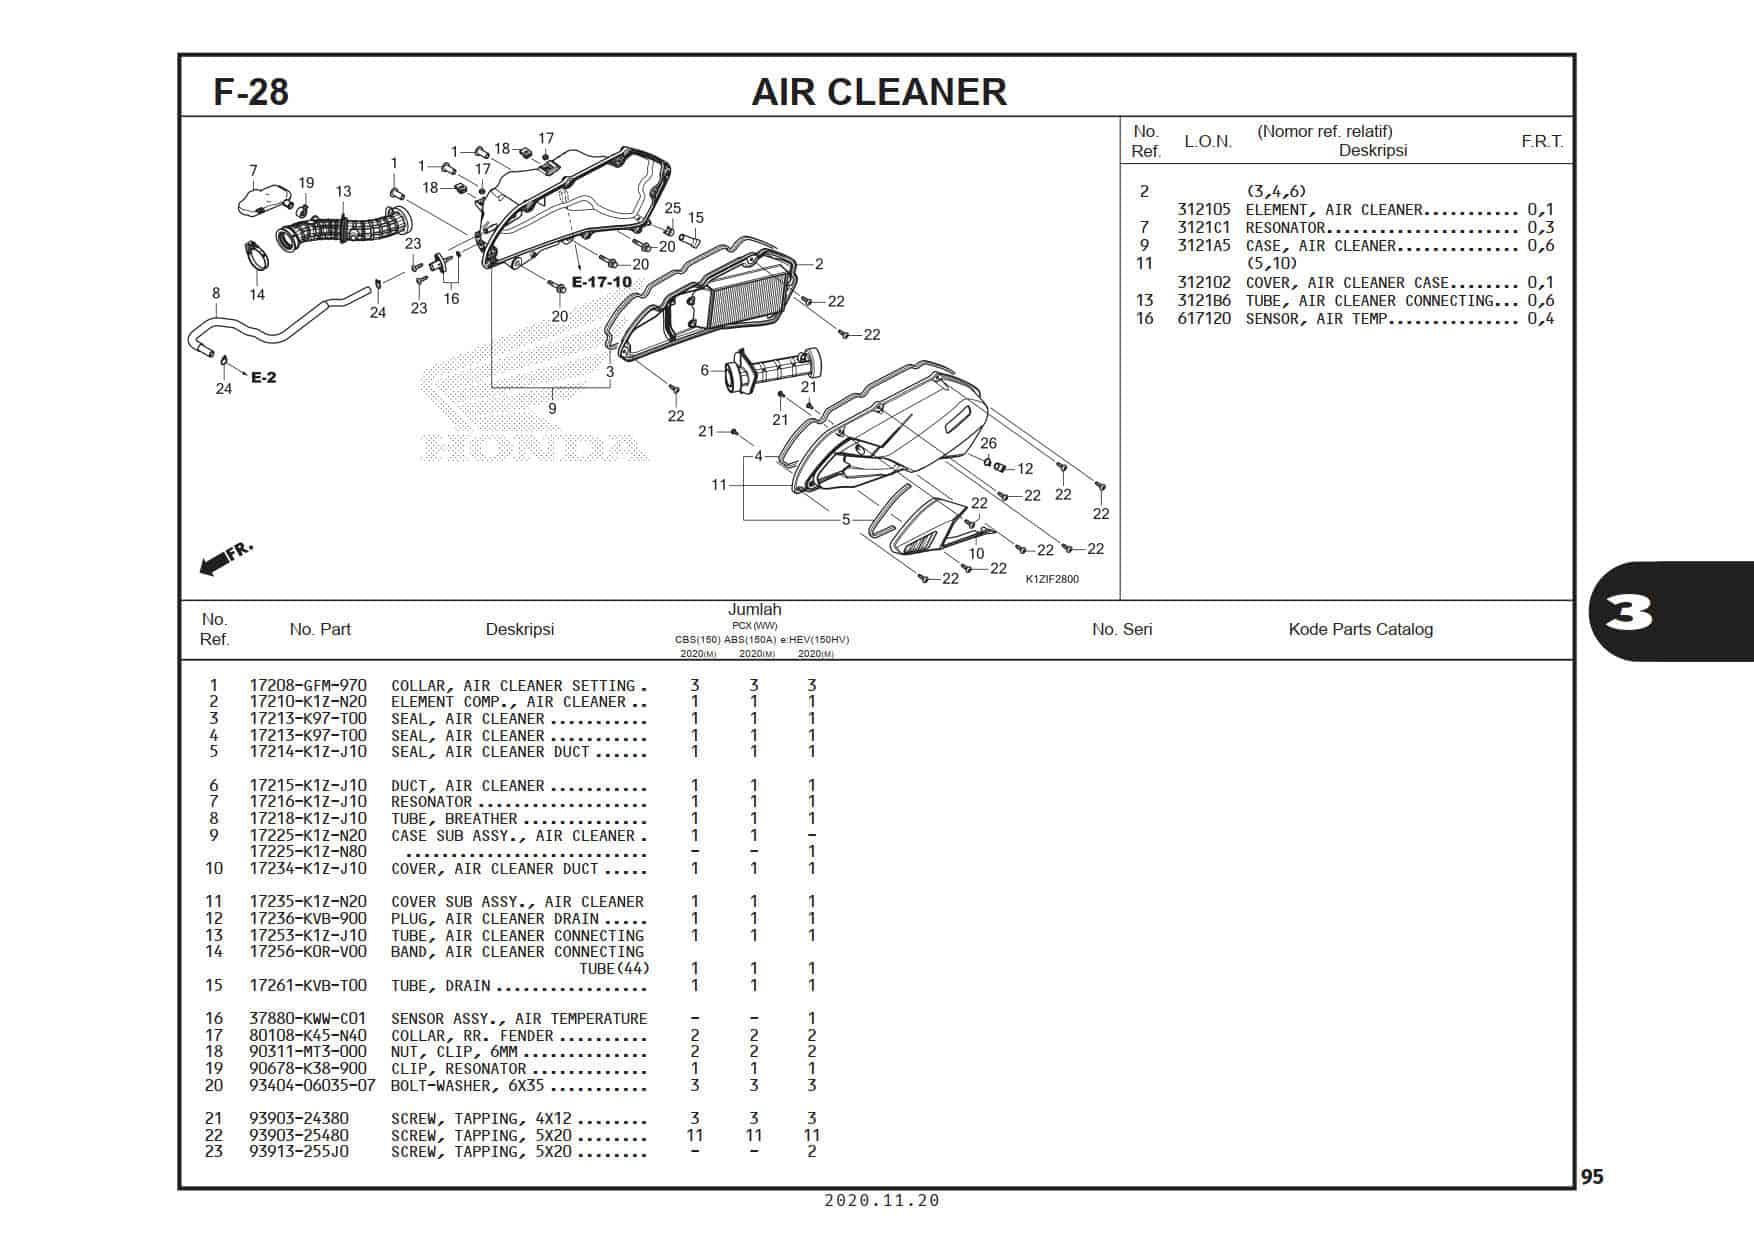 F-28 Air Cleaner